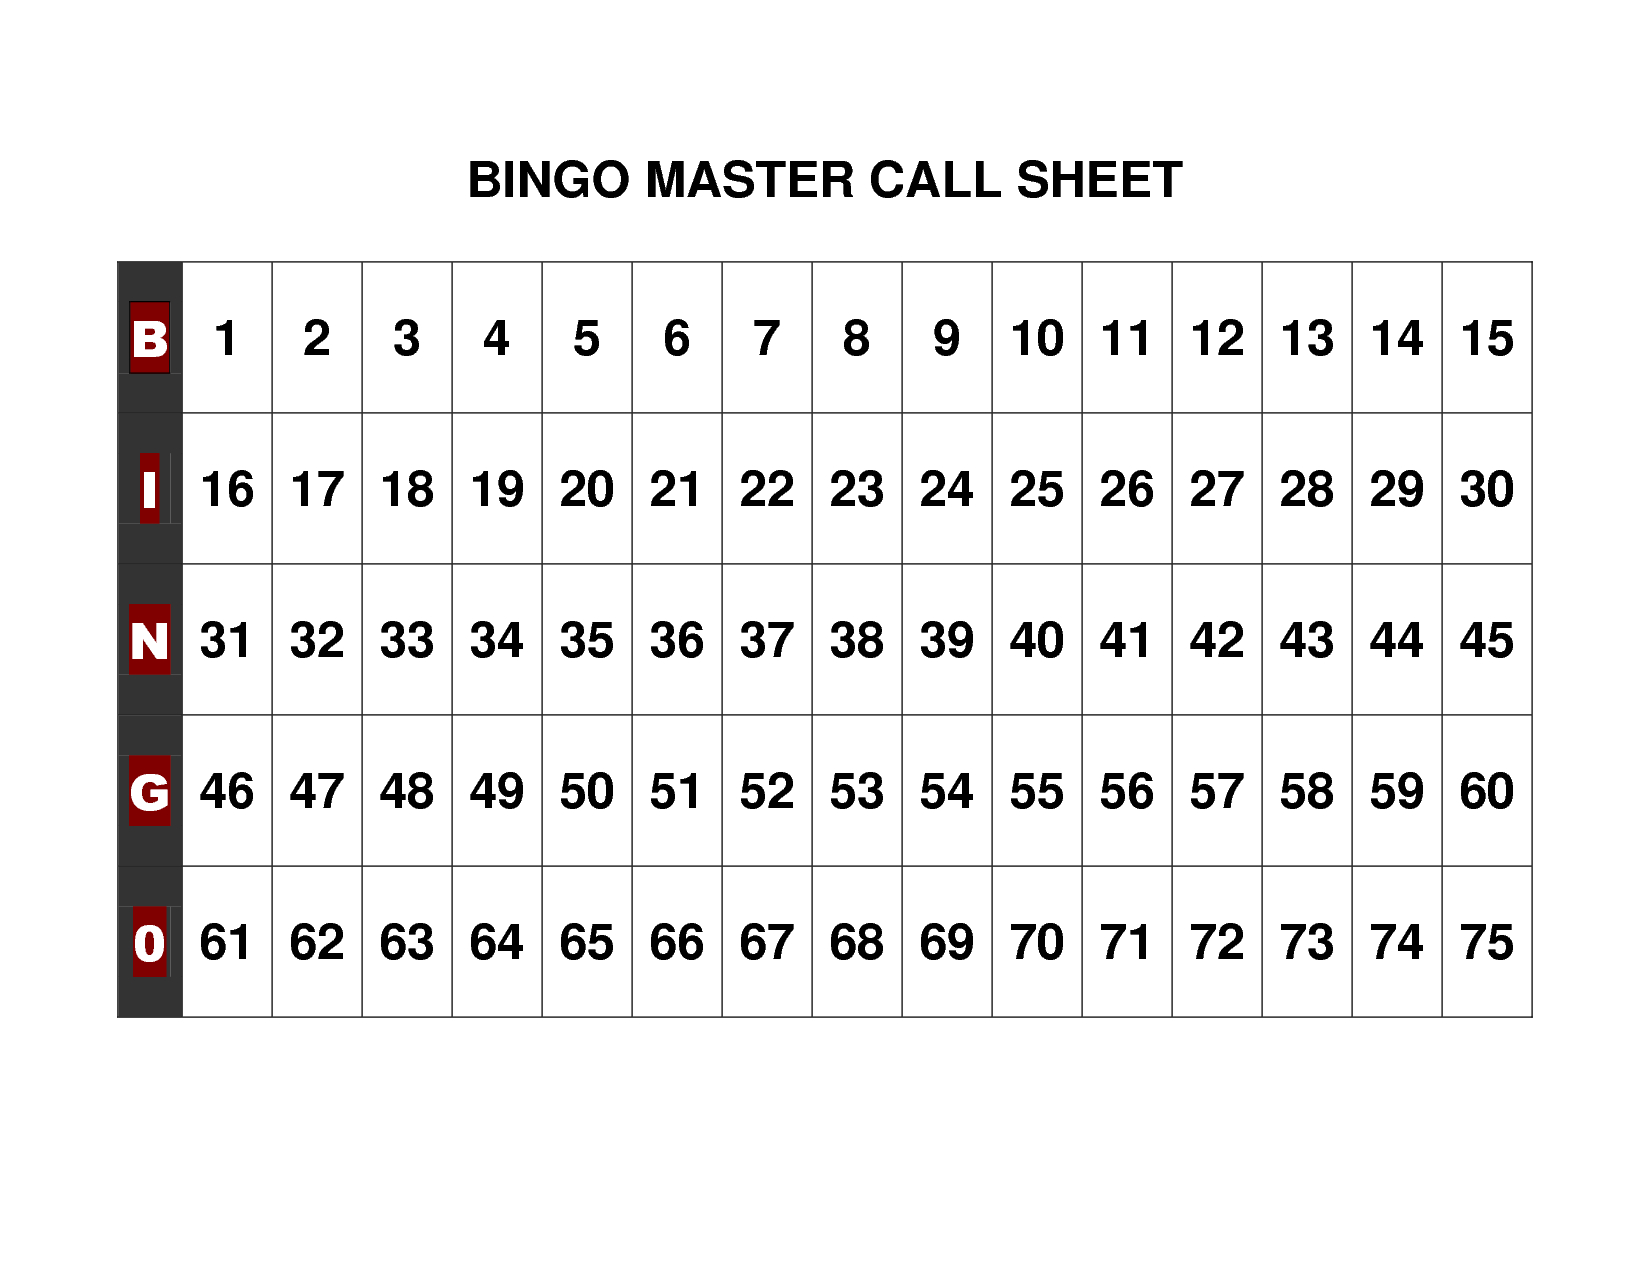 Free+Printable+Bingo+Call+Sheet | Bingo | Bingo Calls, Bingo, Free - Free Printable Bingo Cards Random Numbers